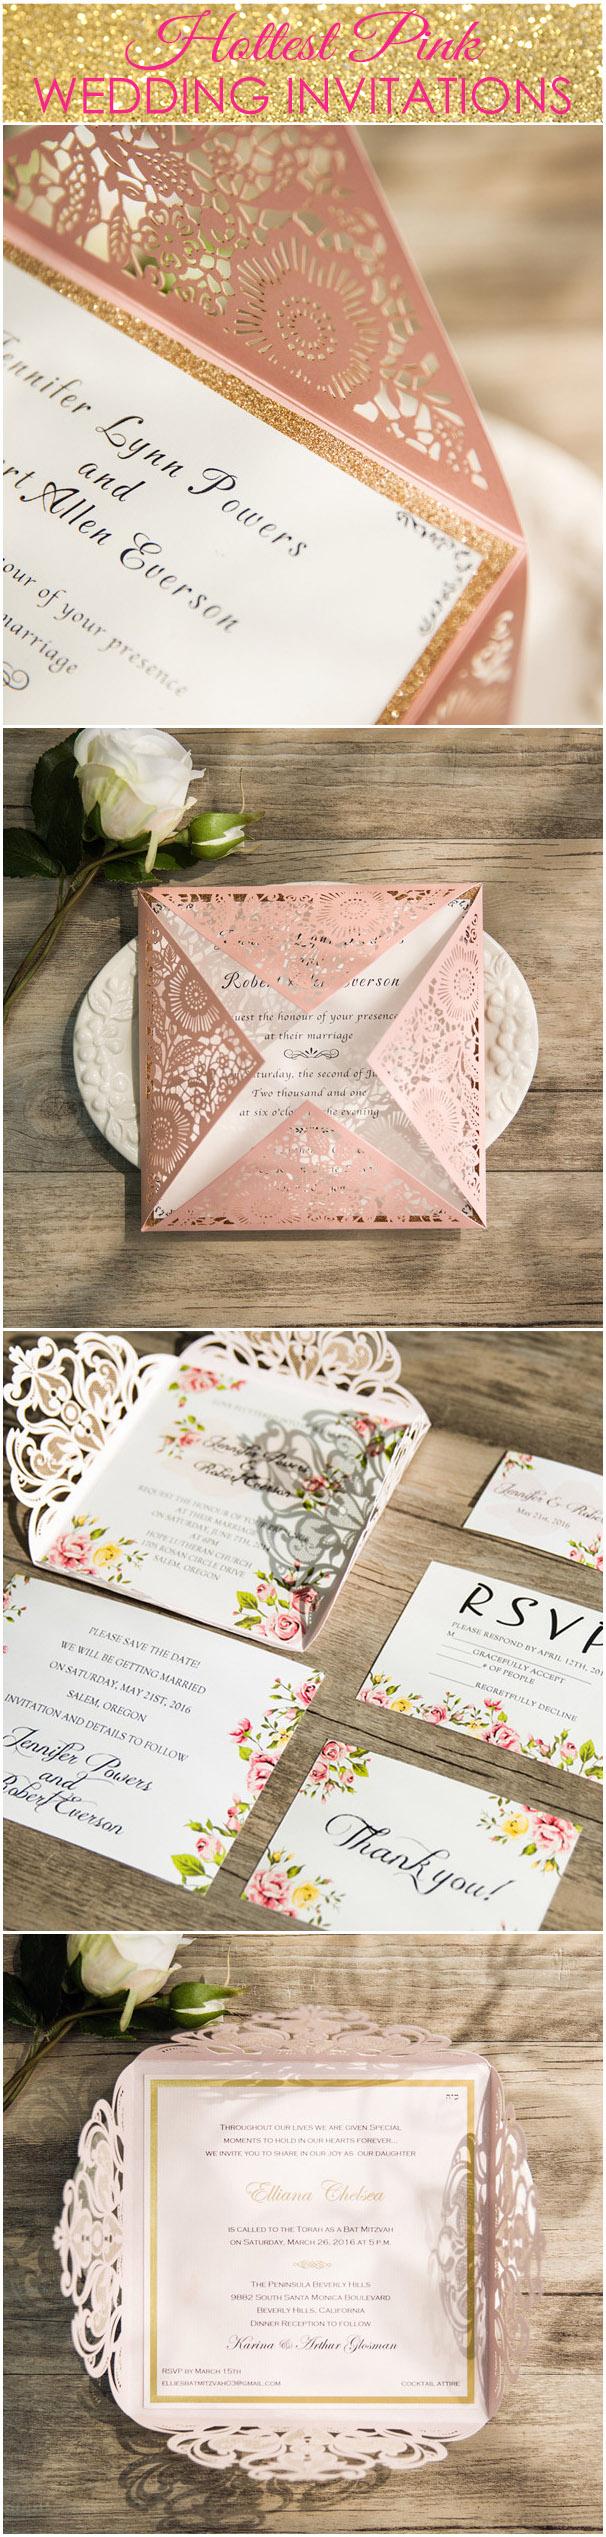 Pink Wedding Invitations Elegant Wedding Invites Elegantweddinginvites Wedding Invitations Uk Affordable Wedding Invitations Cheap Wedding Invitations